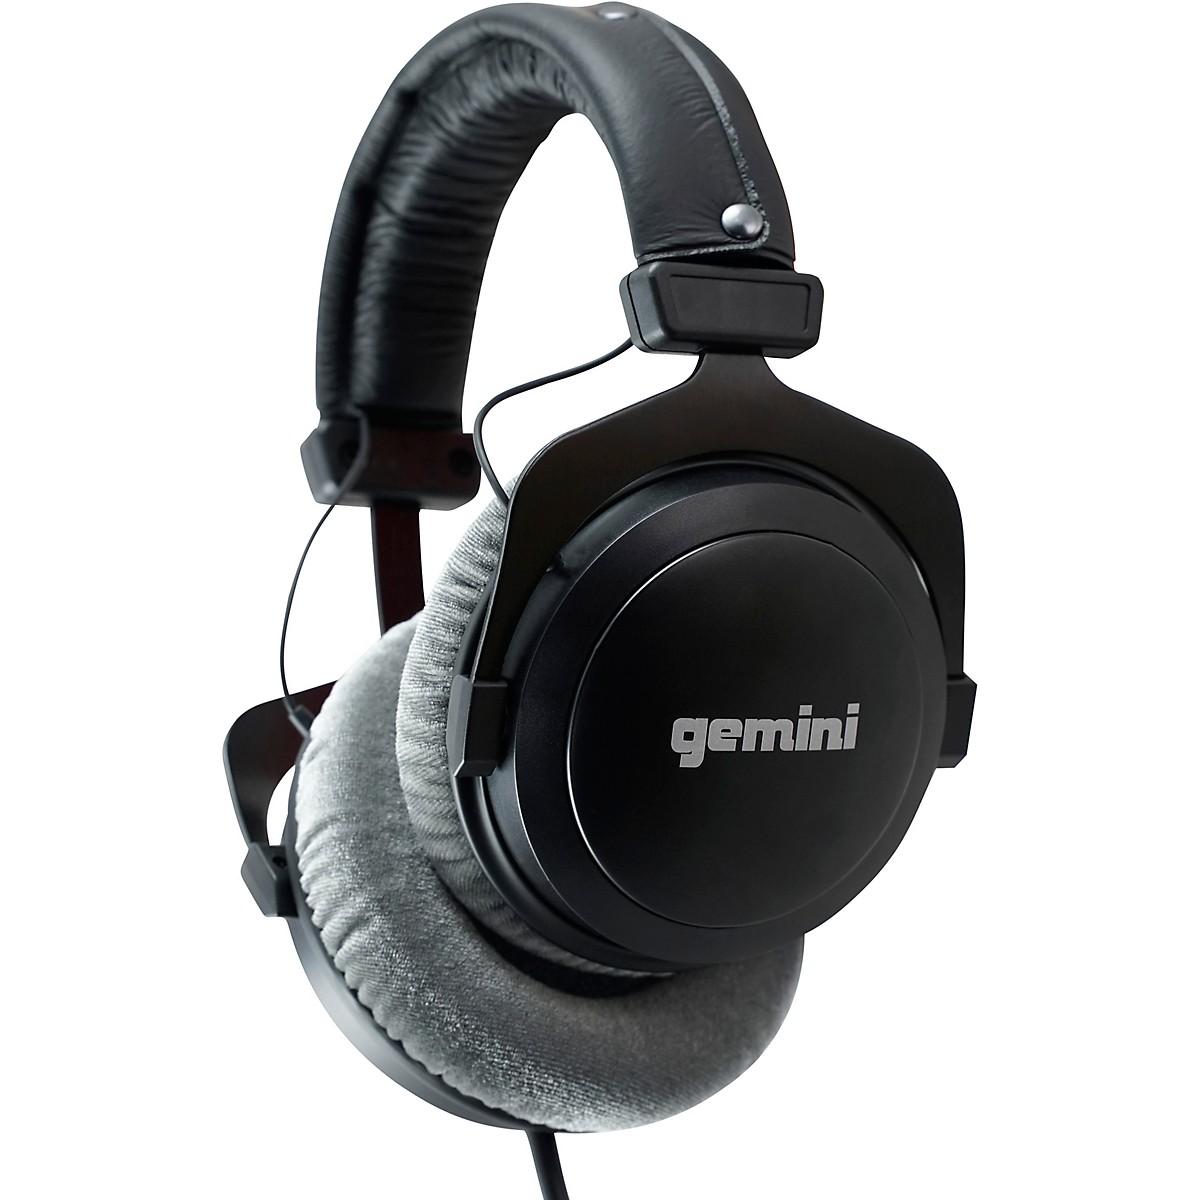 Gemini DJX-1000 Headphones